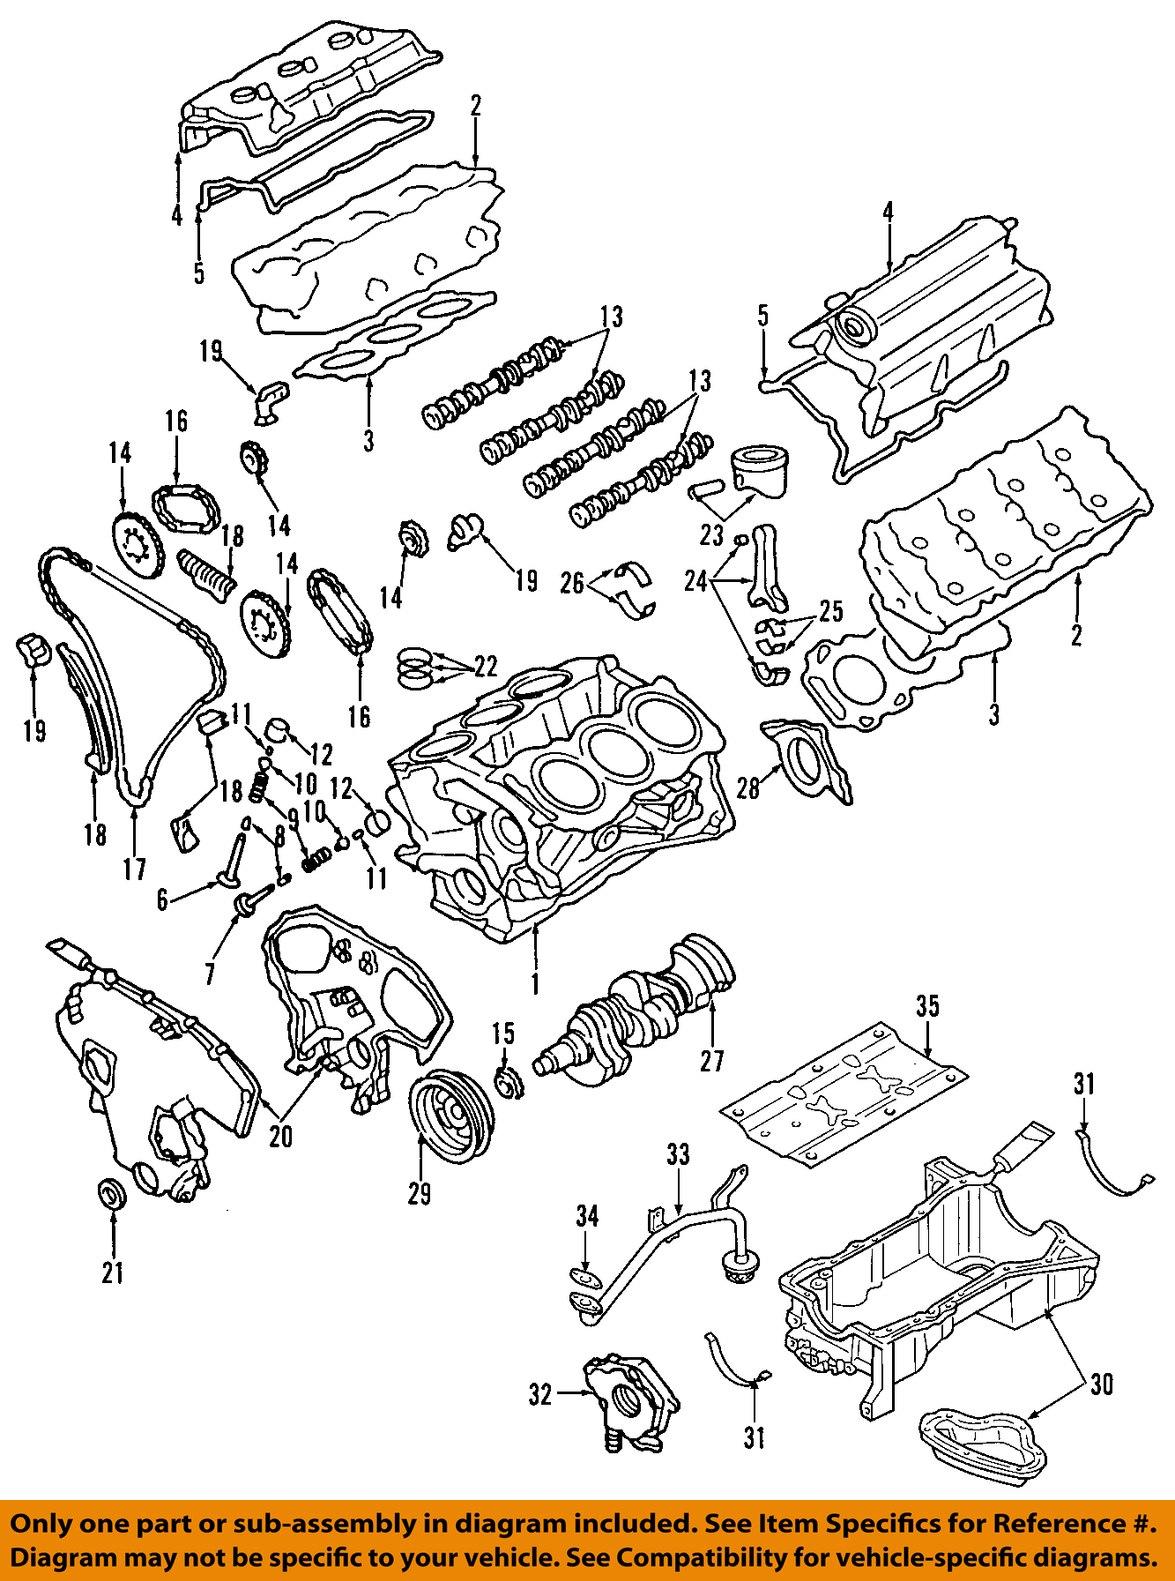 Nissan oem 130707y000 timing damperengine timing chain tensioner nissan oem 130707y000 timing damper engine timing chain vanachro Choice Image